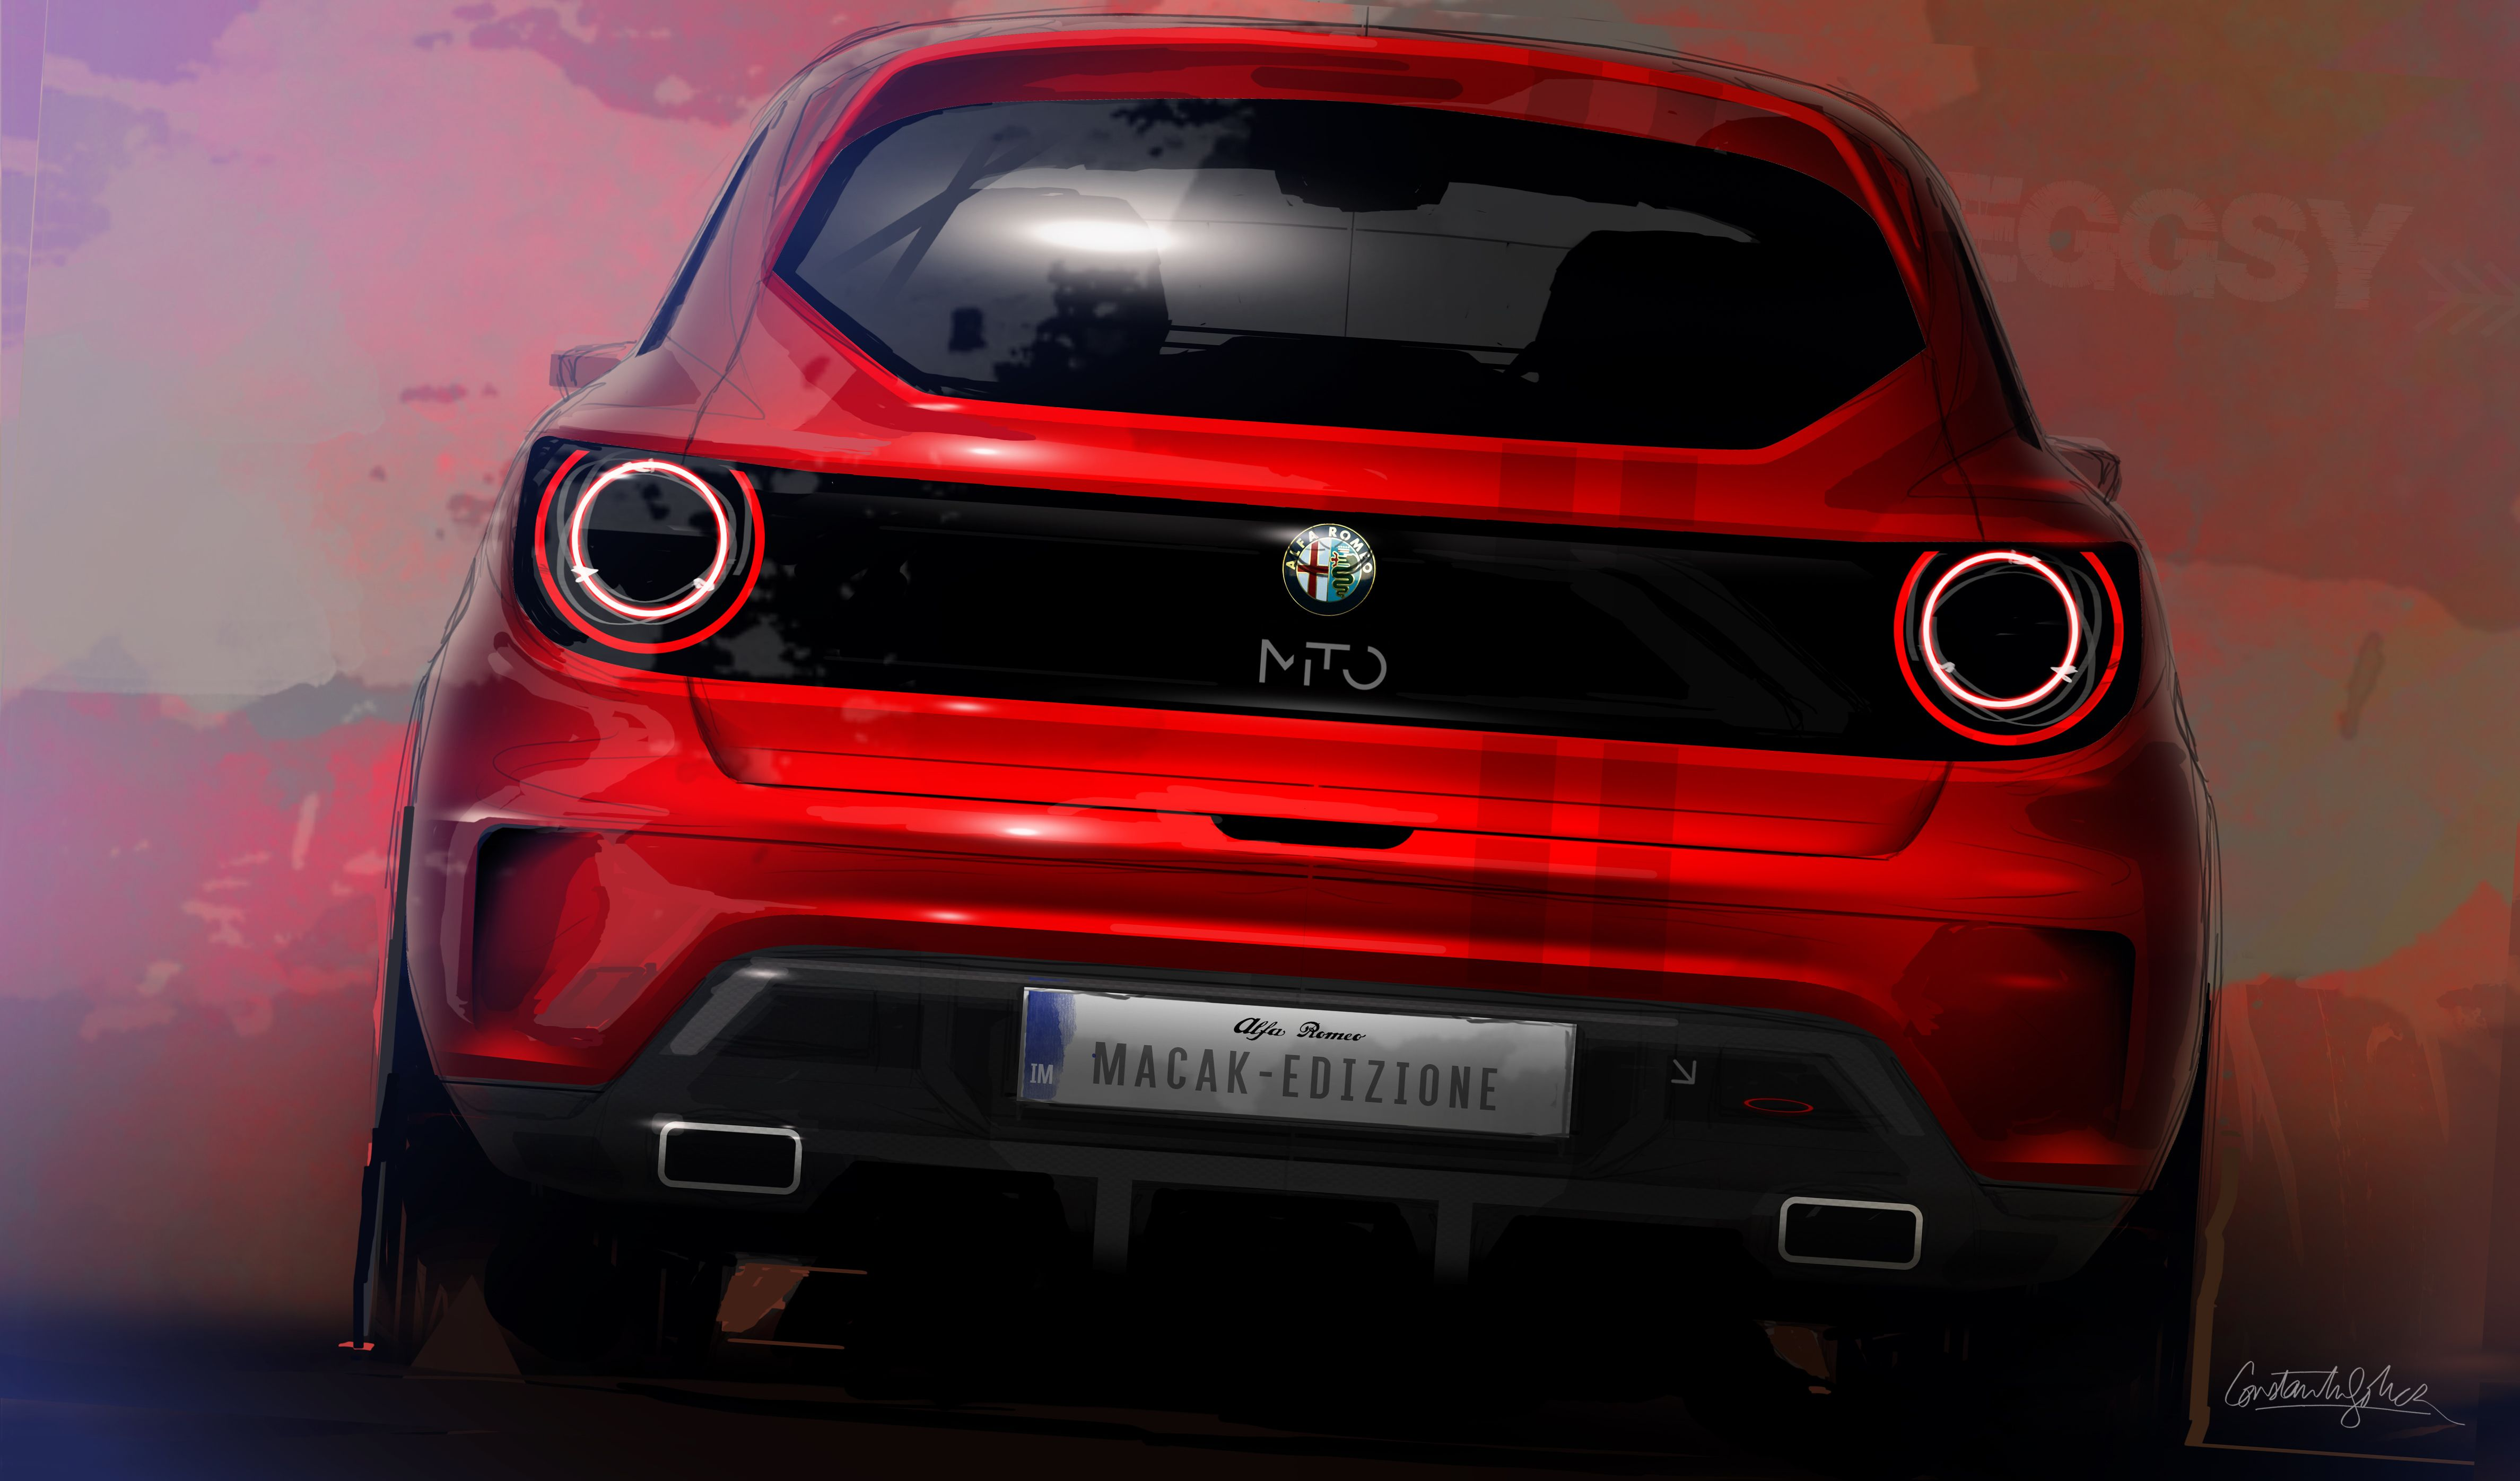 Alfa Romeo Mito Design Sketch - Constantin Sohier